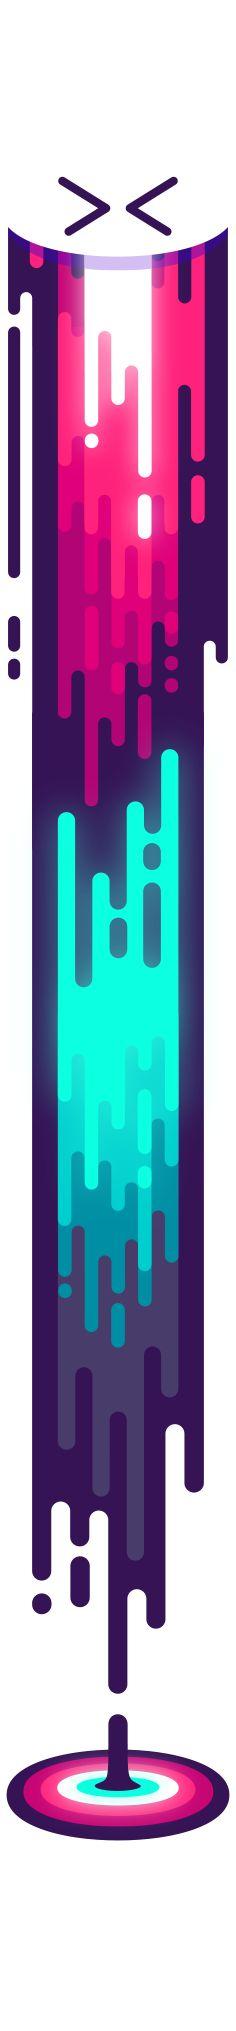 We ❤ Nina Geometrieva  #DigitalArt #DigitalArtist #Artprint #Artwork #Vectoriel